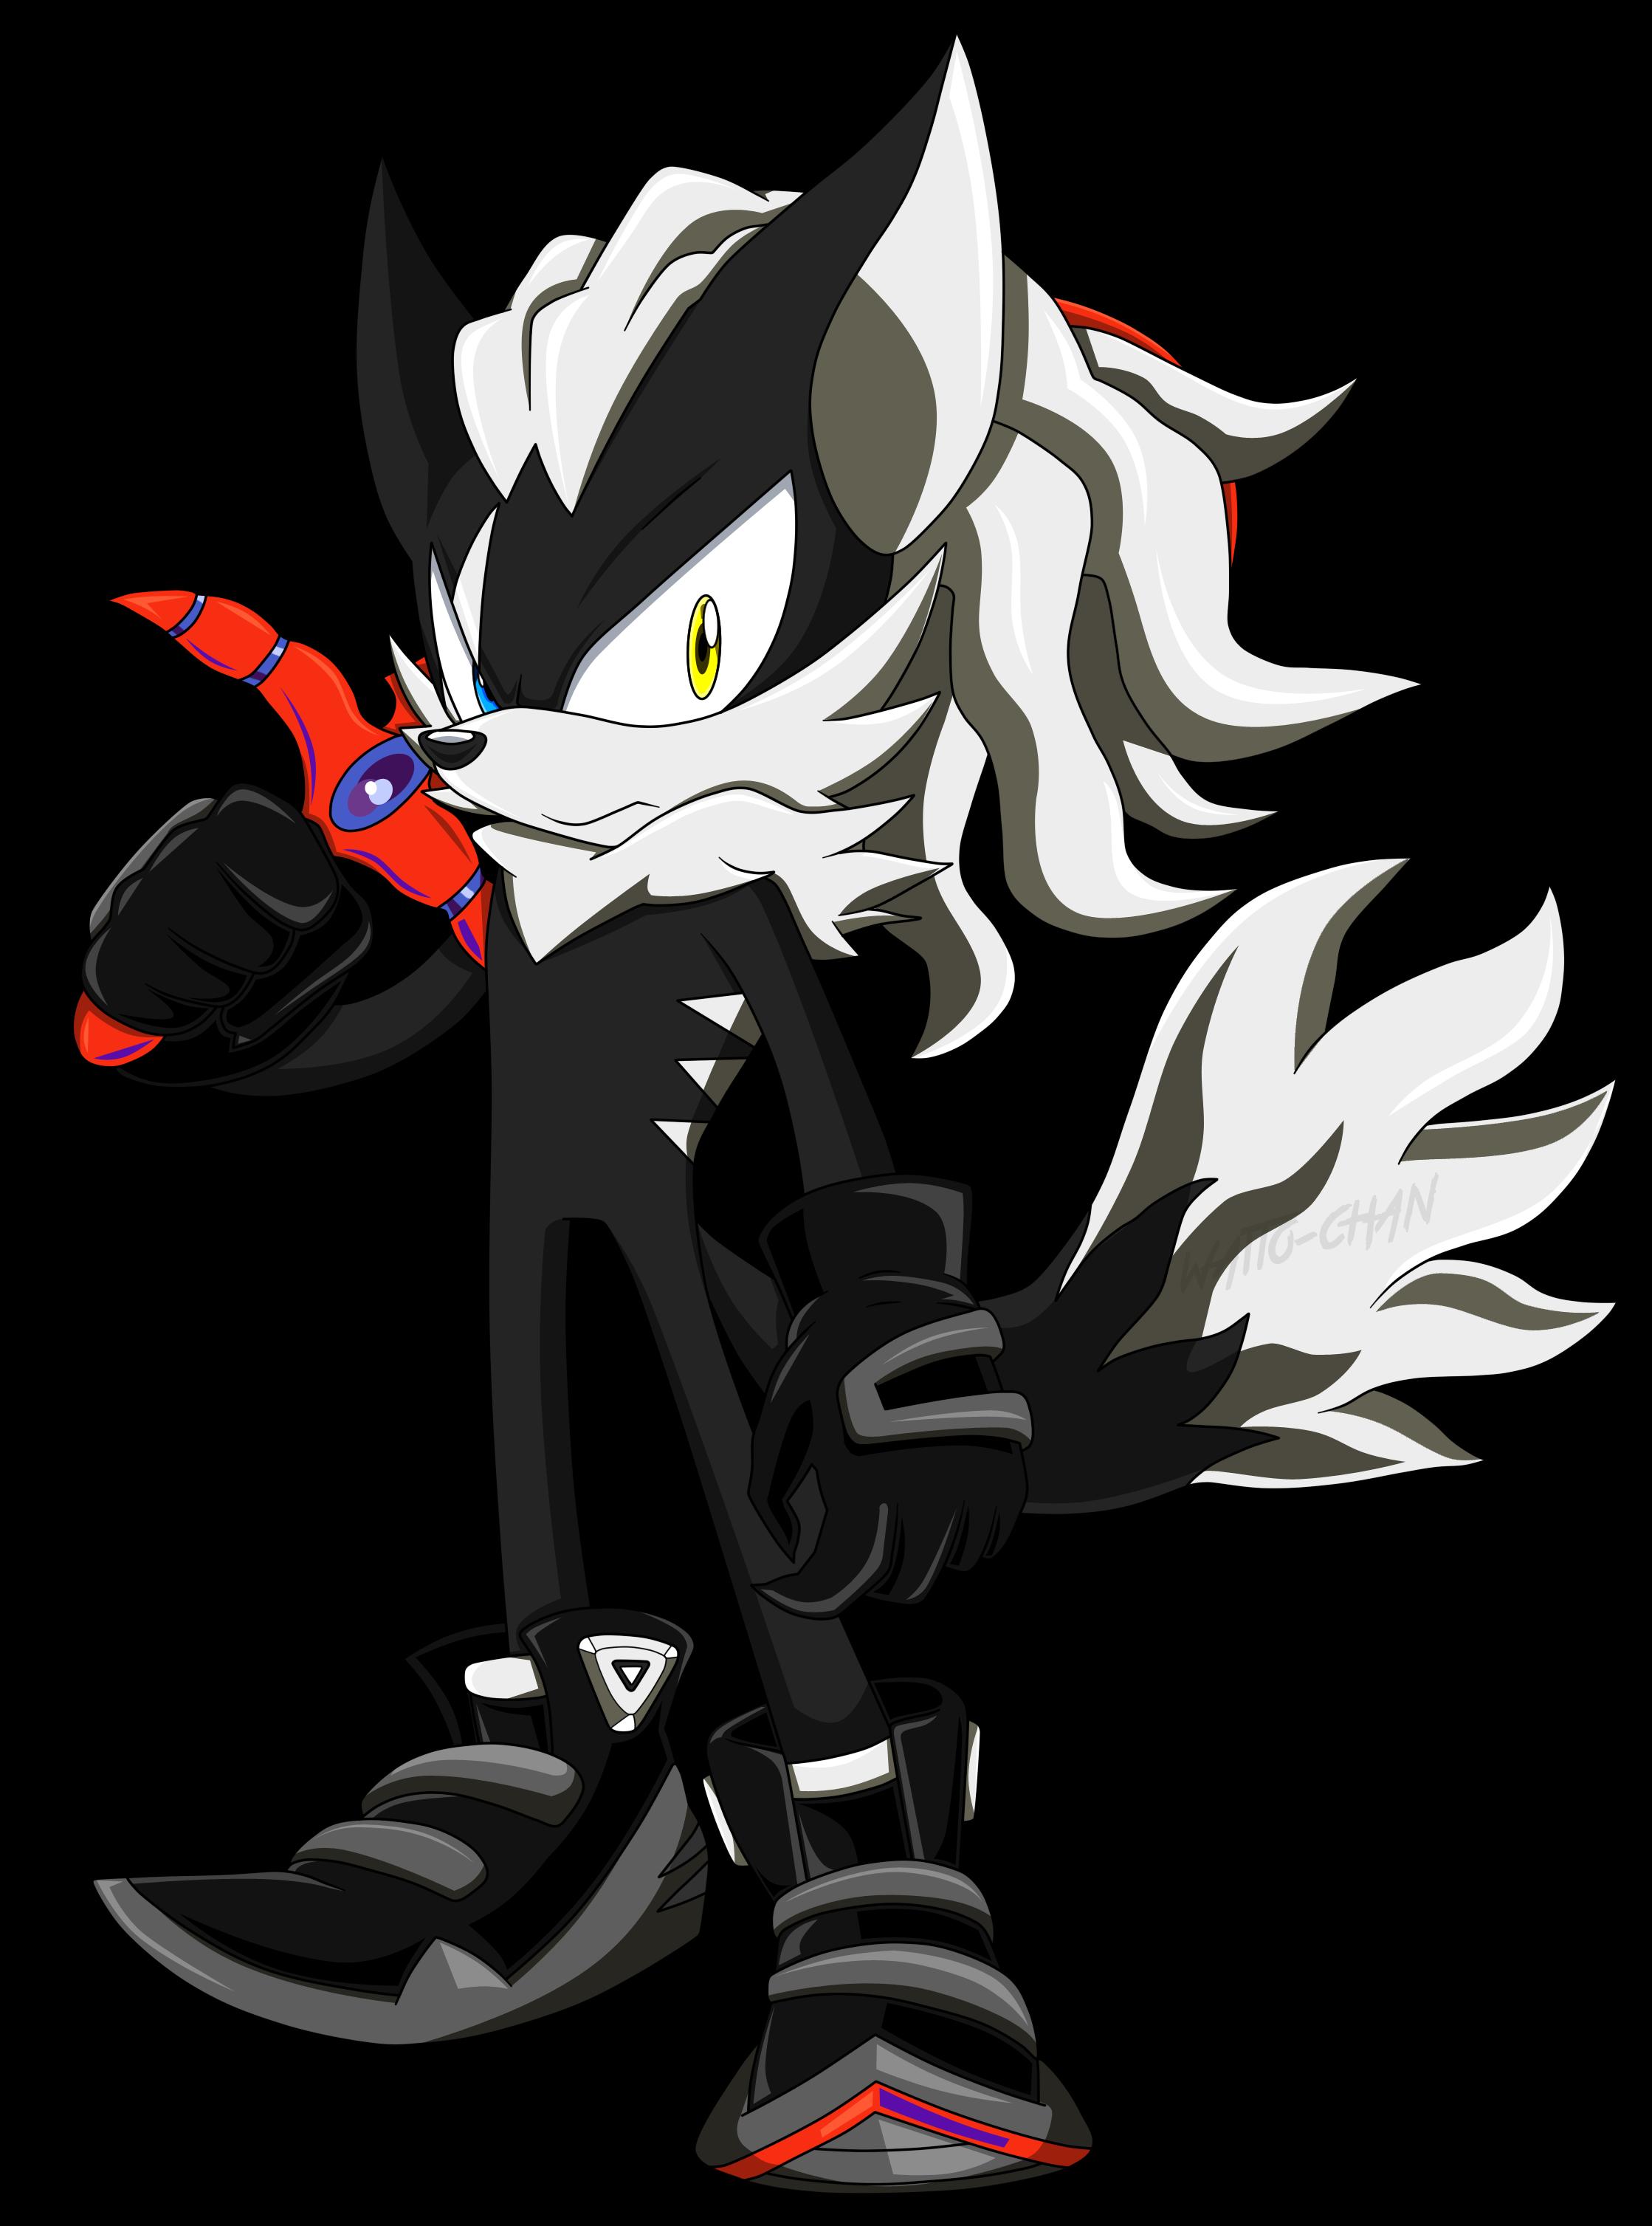 Infinite The Jackal By Waitochan On Deviantart Sonic Fan Characters Sonic The Hedgehog Sonic